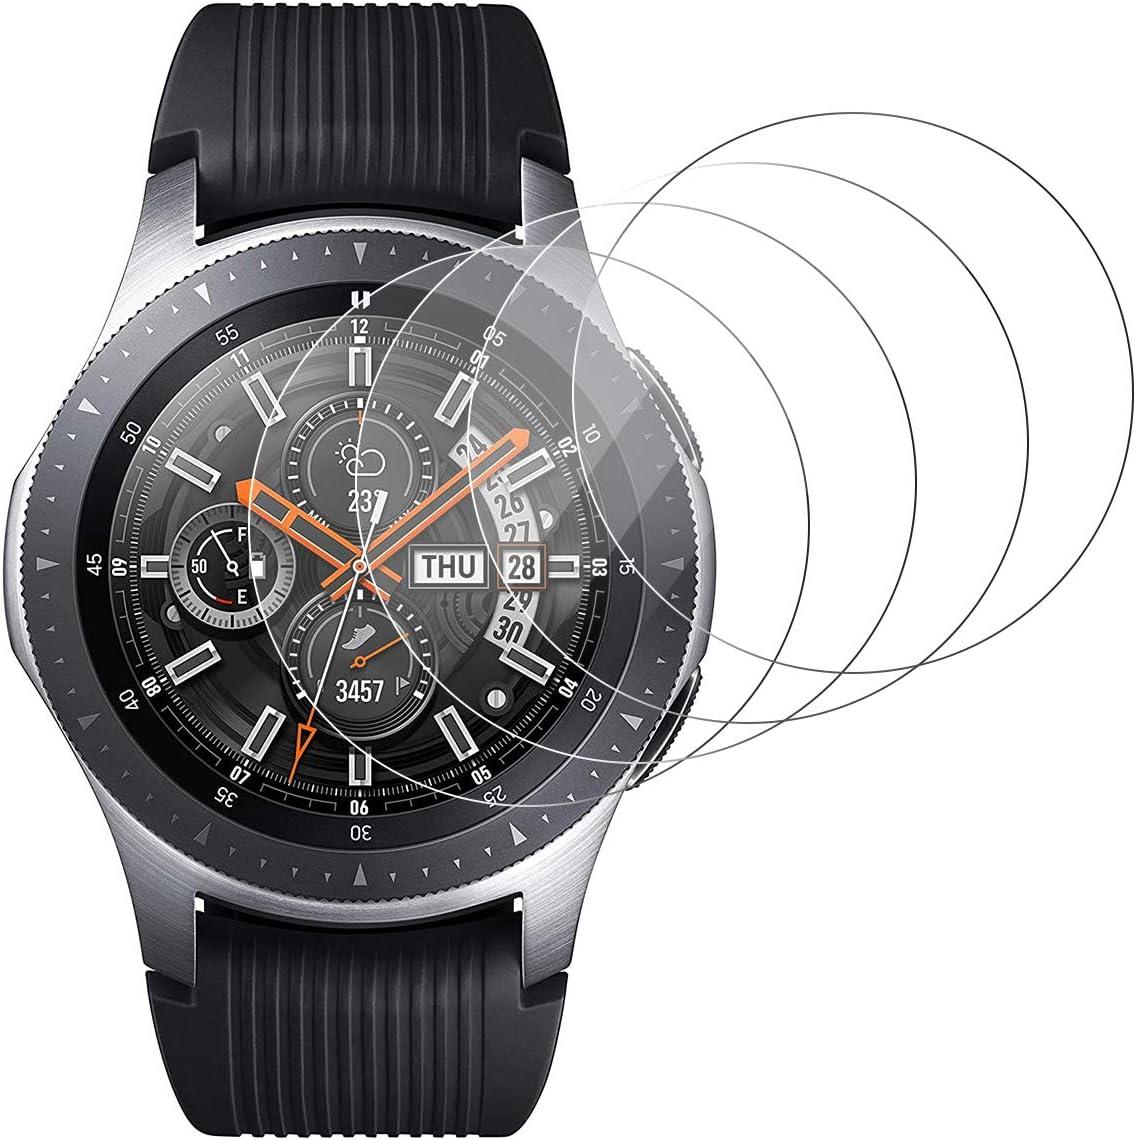 RSSYTZ [4 Unidades Protector de Pantalla para Samsung Galaxy Watch Active 2 46mm [9H Dureza] [Impermeable] [antiburbujas] Cristal Vidrio Templado para Samsung Galaxy Watch Active 2 46mm Watch